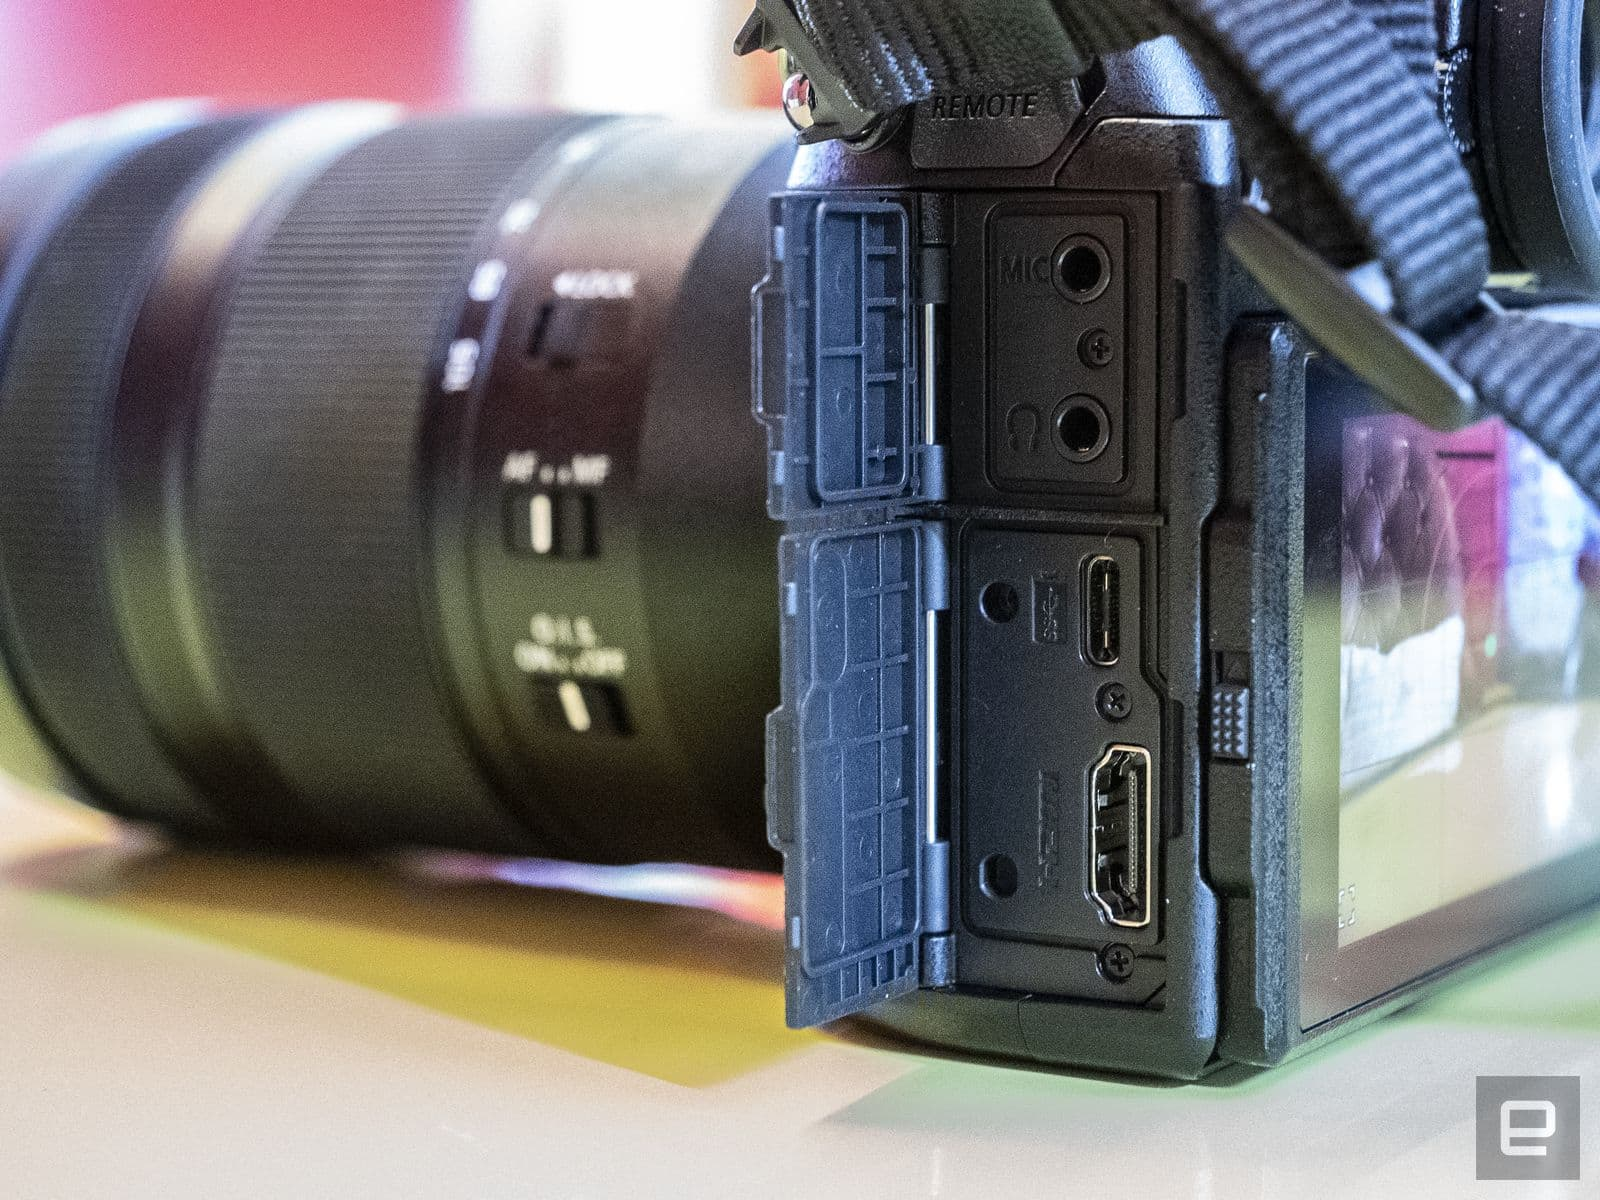 Panasonic S1 and S1R full-frame mirrorless cameras